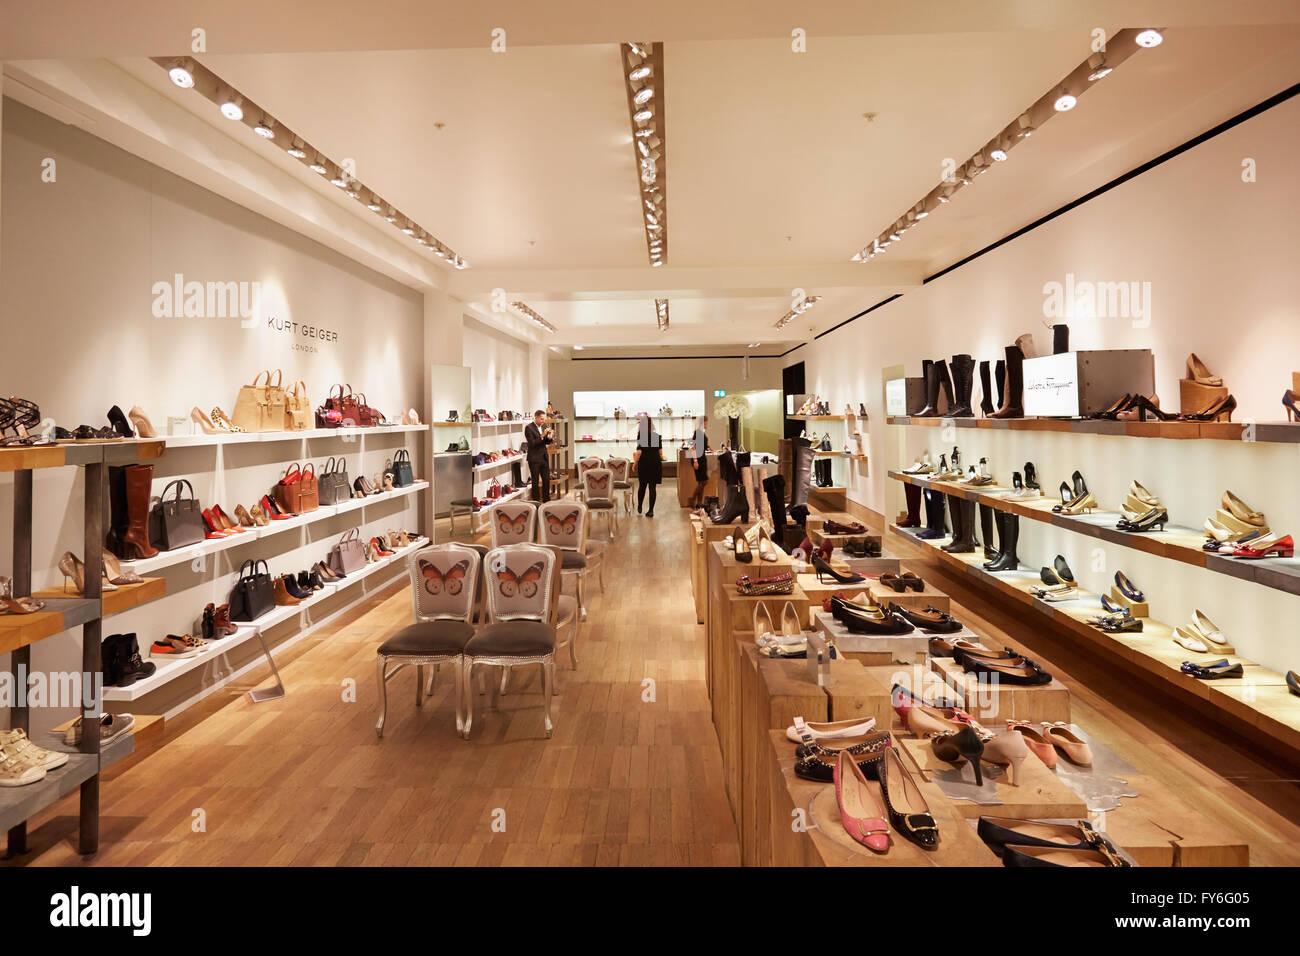 Selfridges department store interior, shoes area - Stock Image